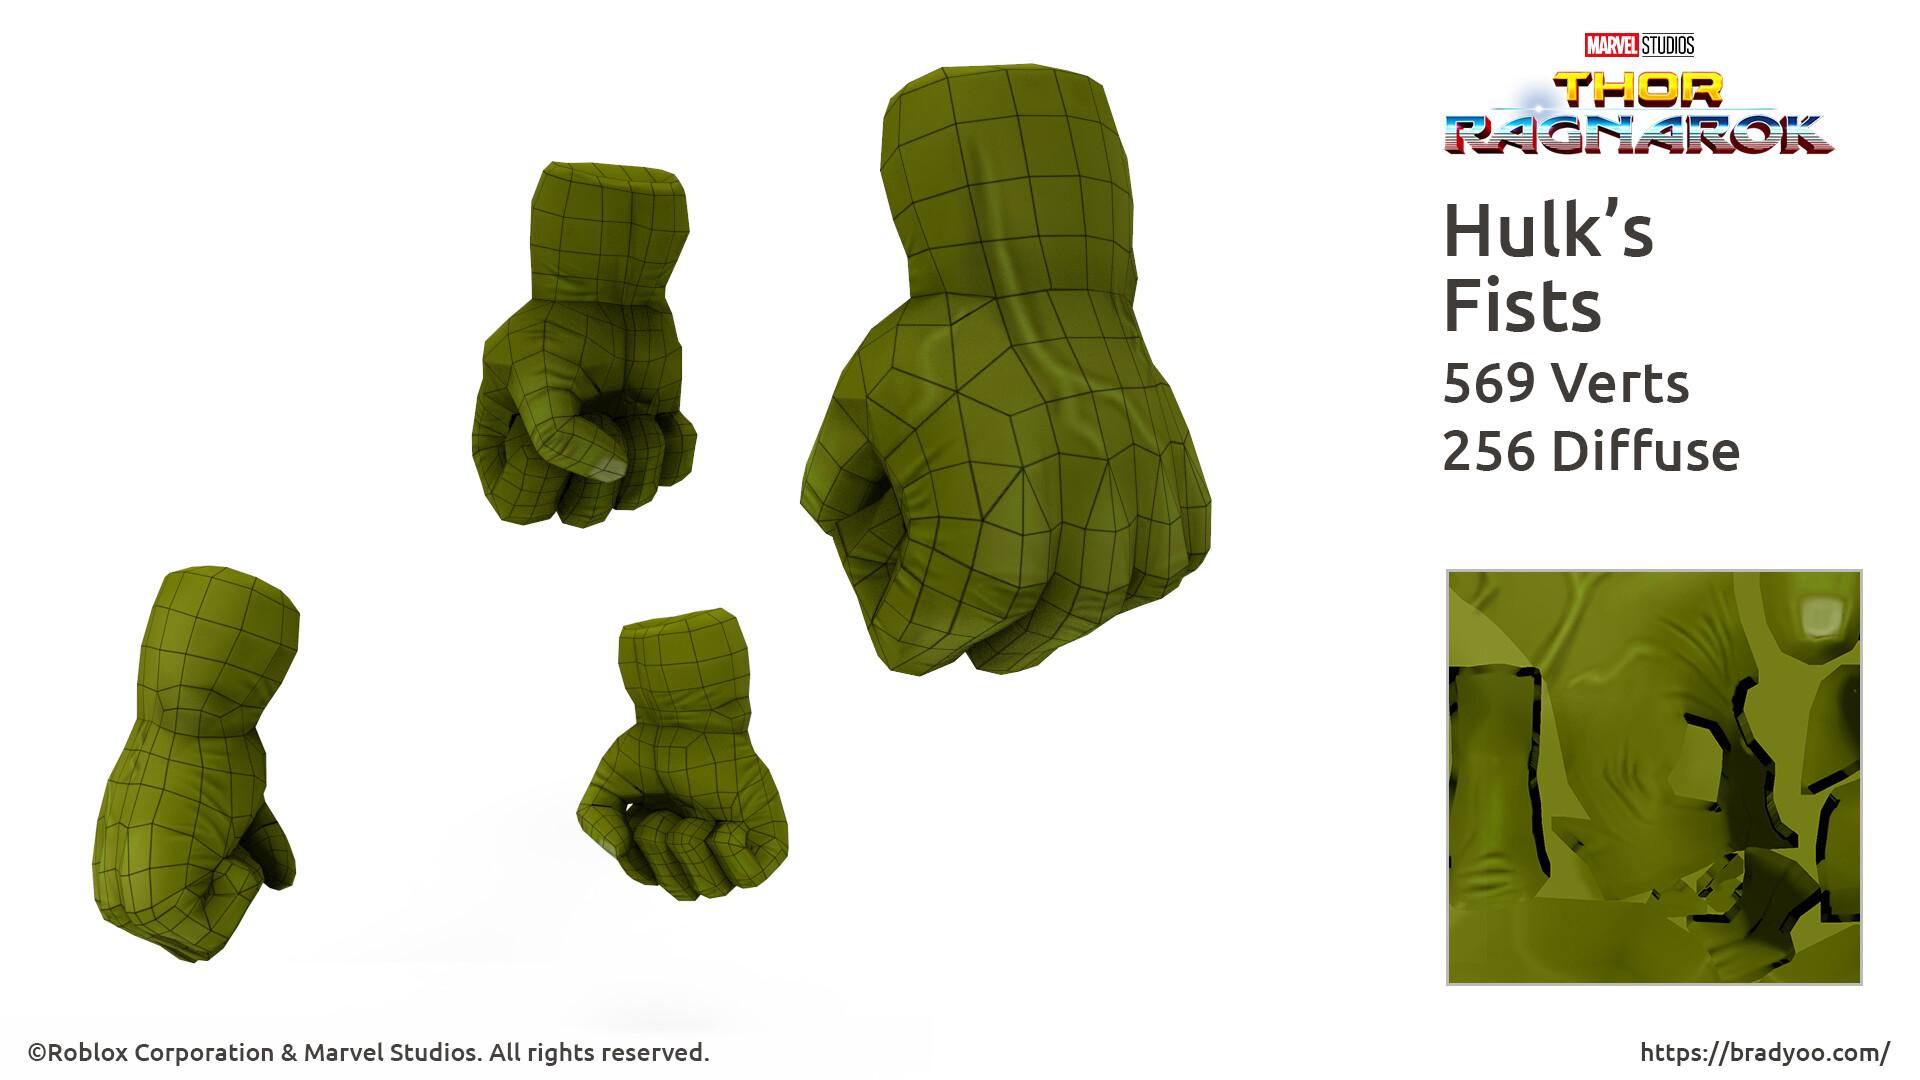 Brx yoo ragnarok hulk fists img 02